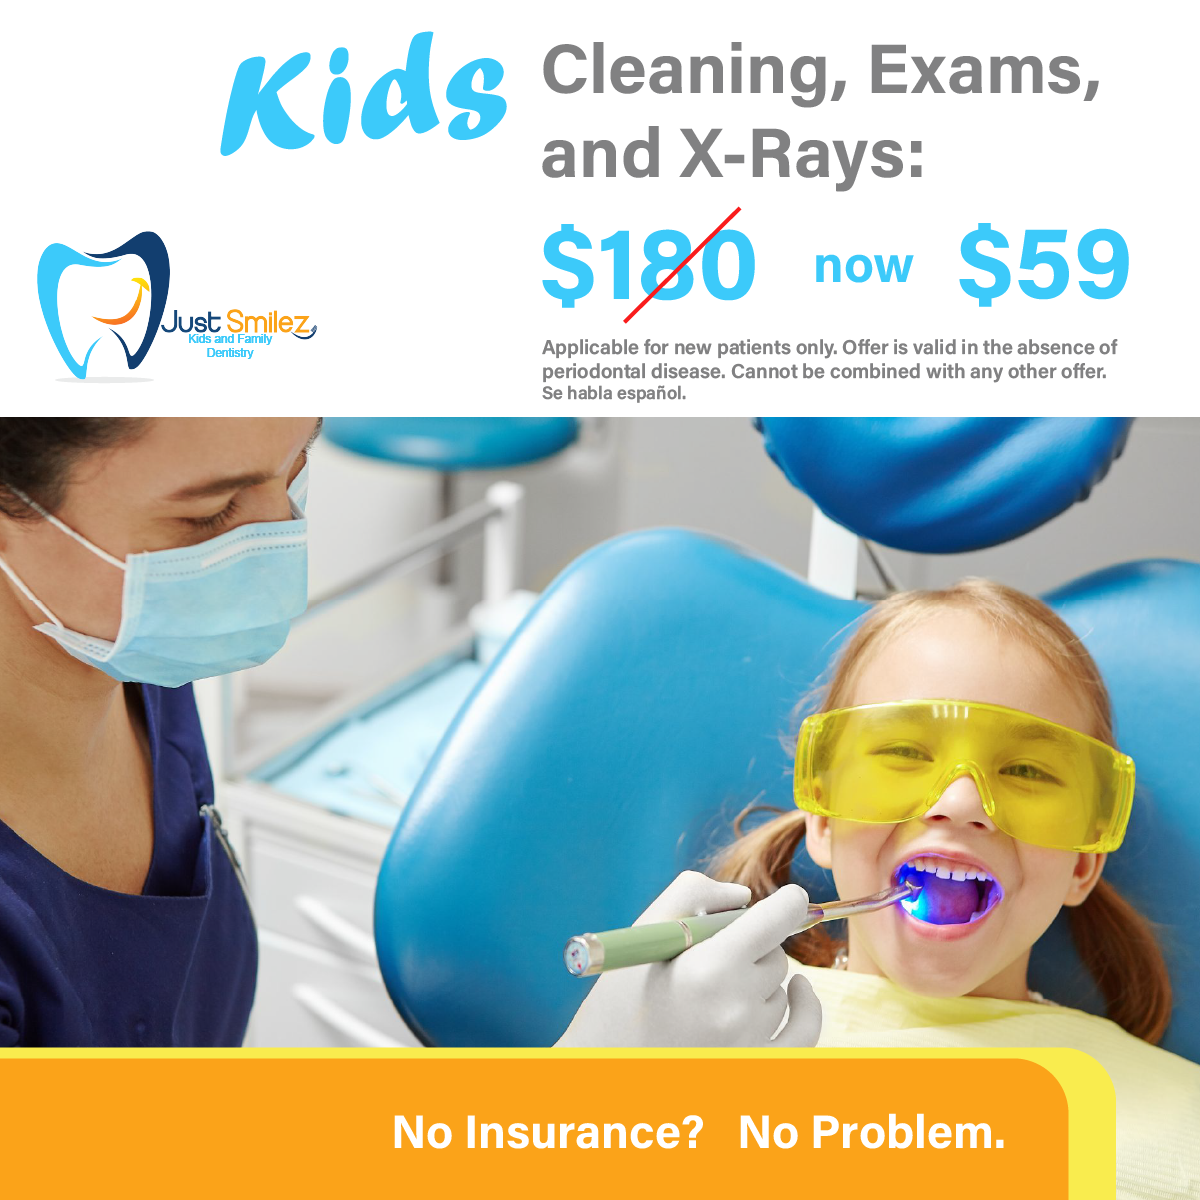 vienna family dental care